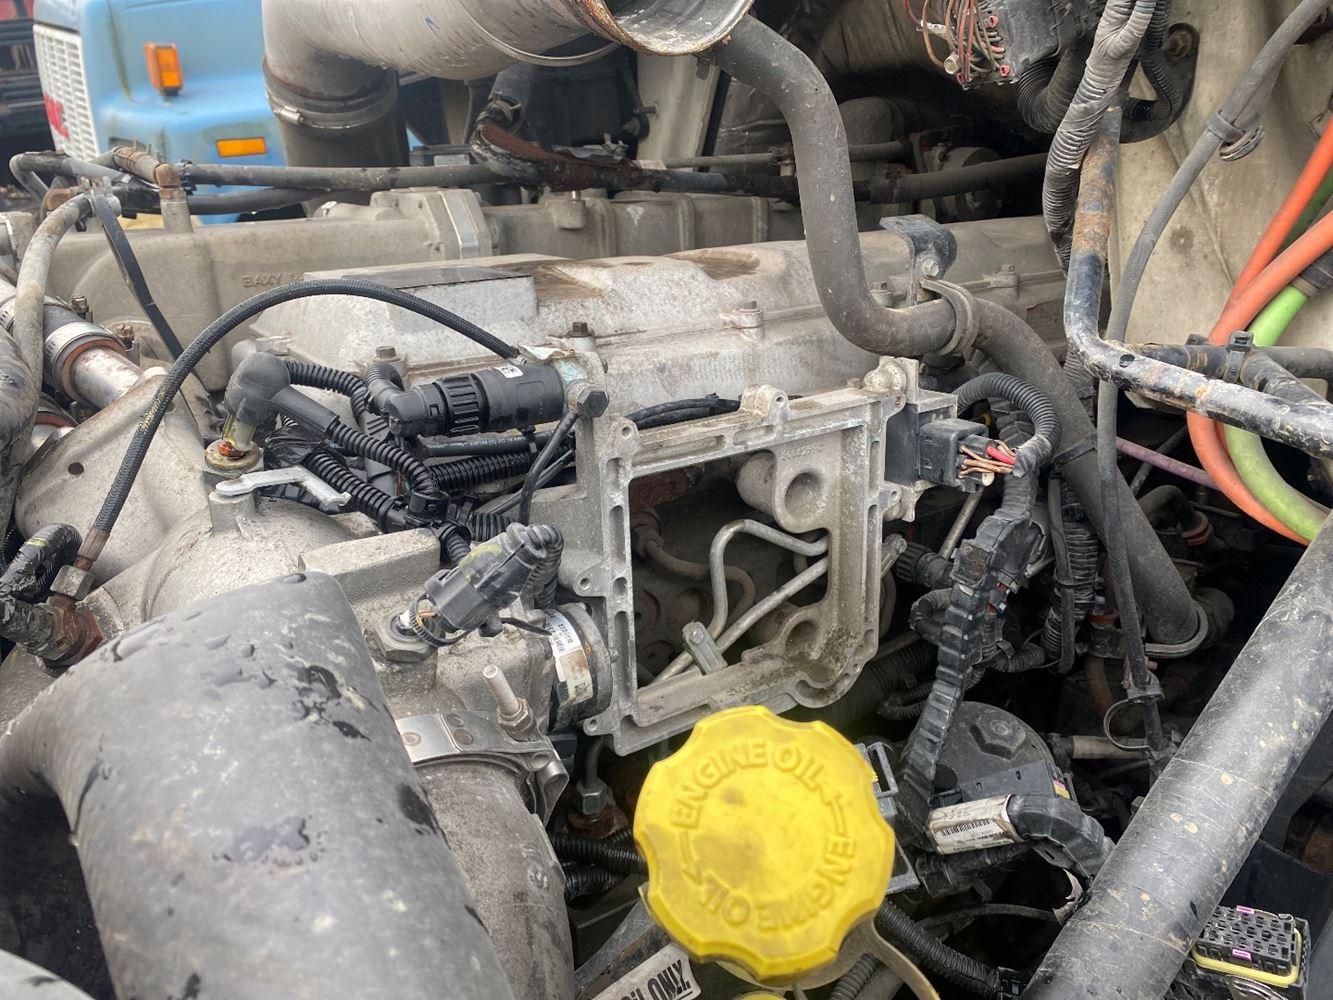 2014 INTERNATIONAL MAXXFORCE 13 ENGINE ASSEMBLY TRUCK PARTS #703137